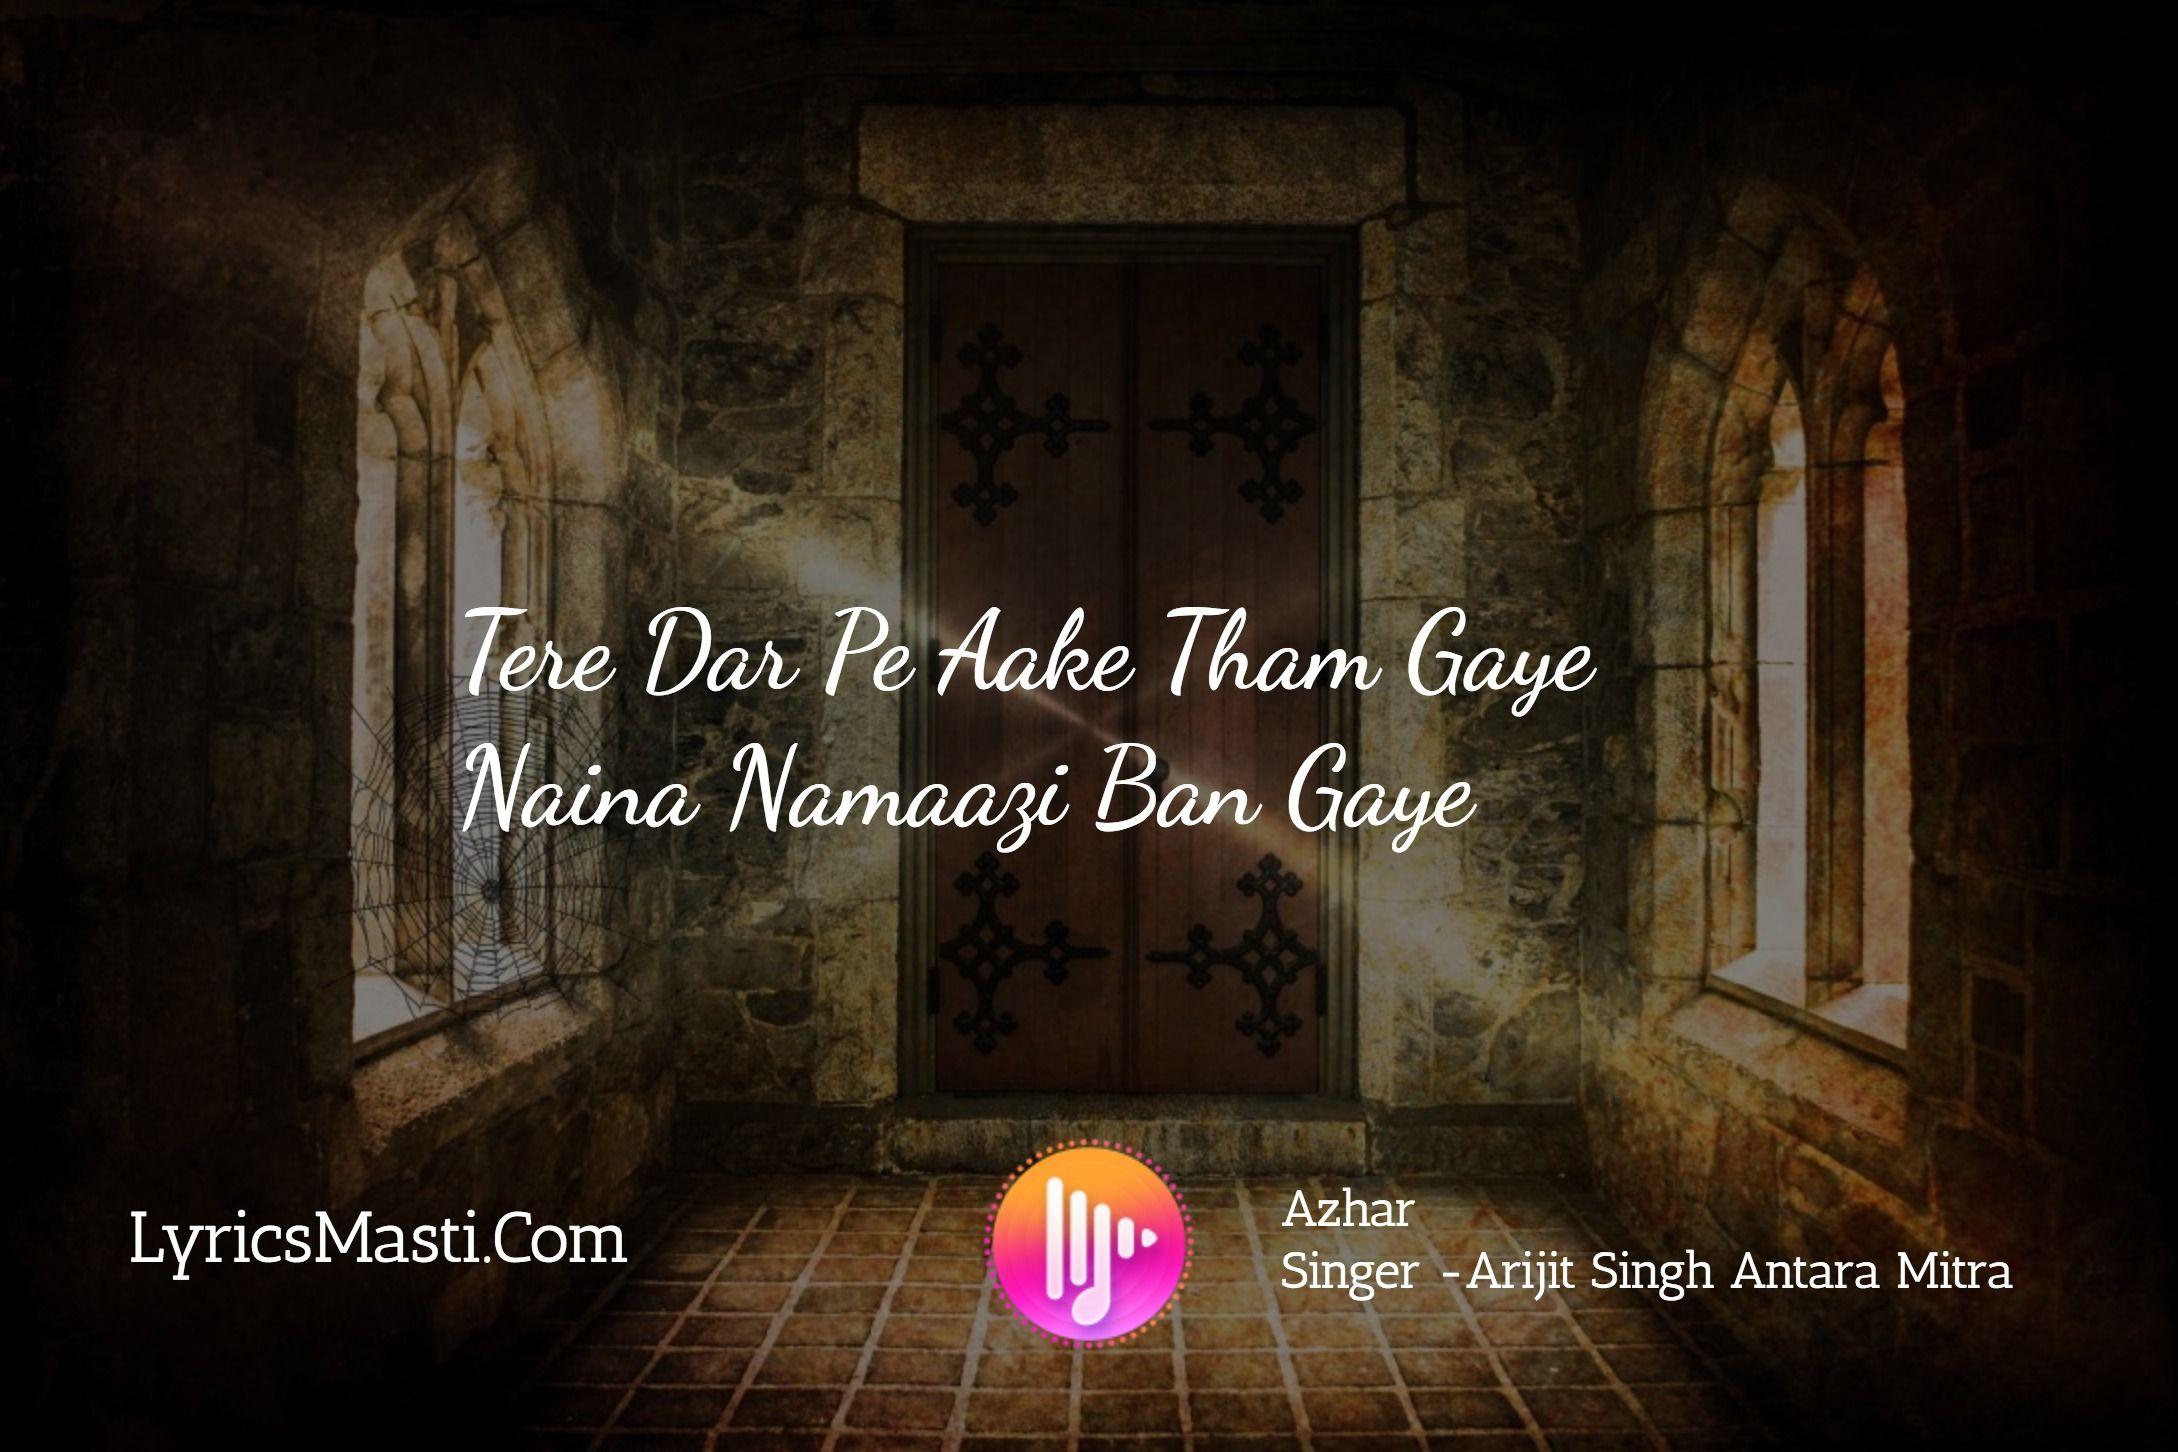 Sun Mere Humsafar Kya Tujhe Itni Si Bhi Khabar Badrinath Ki Dulhania Bollywood Music Videos Bollywood Movie Songs Hindi Movie Song